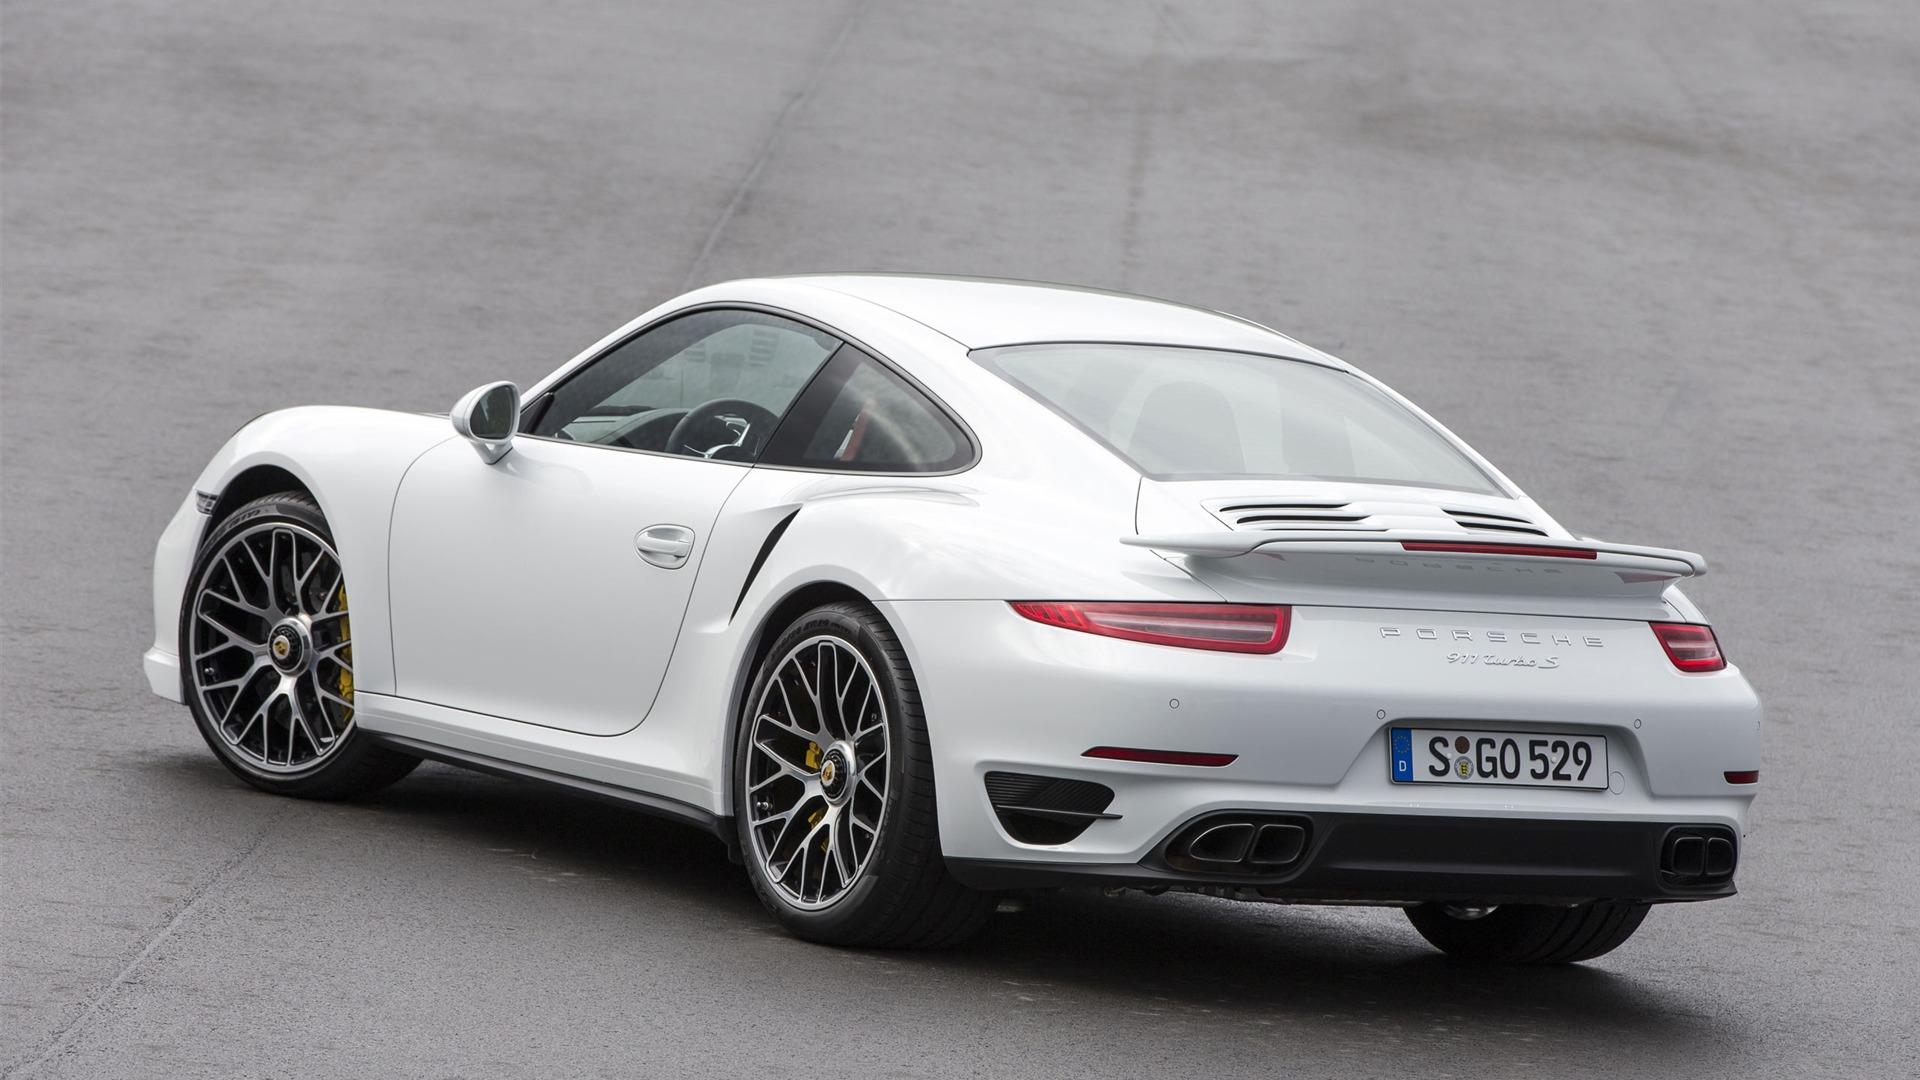 2014 porsche 911 turbo s car hd wallpaper 16 1920x1080 wallpaper download - Porsche 911 Turbo 2014 Wallpaper